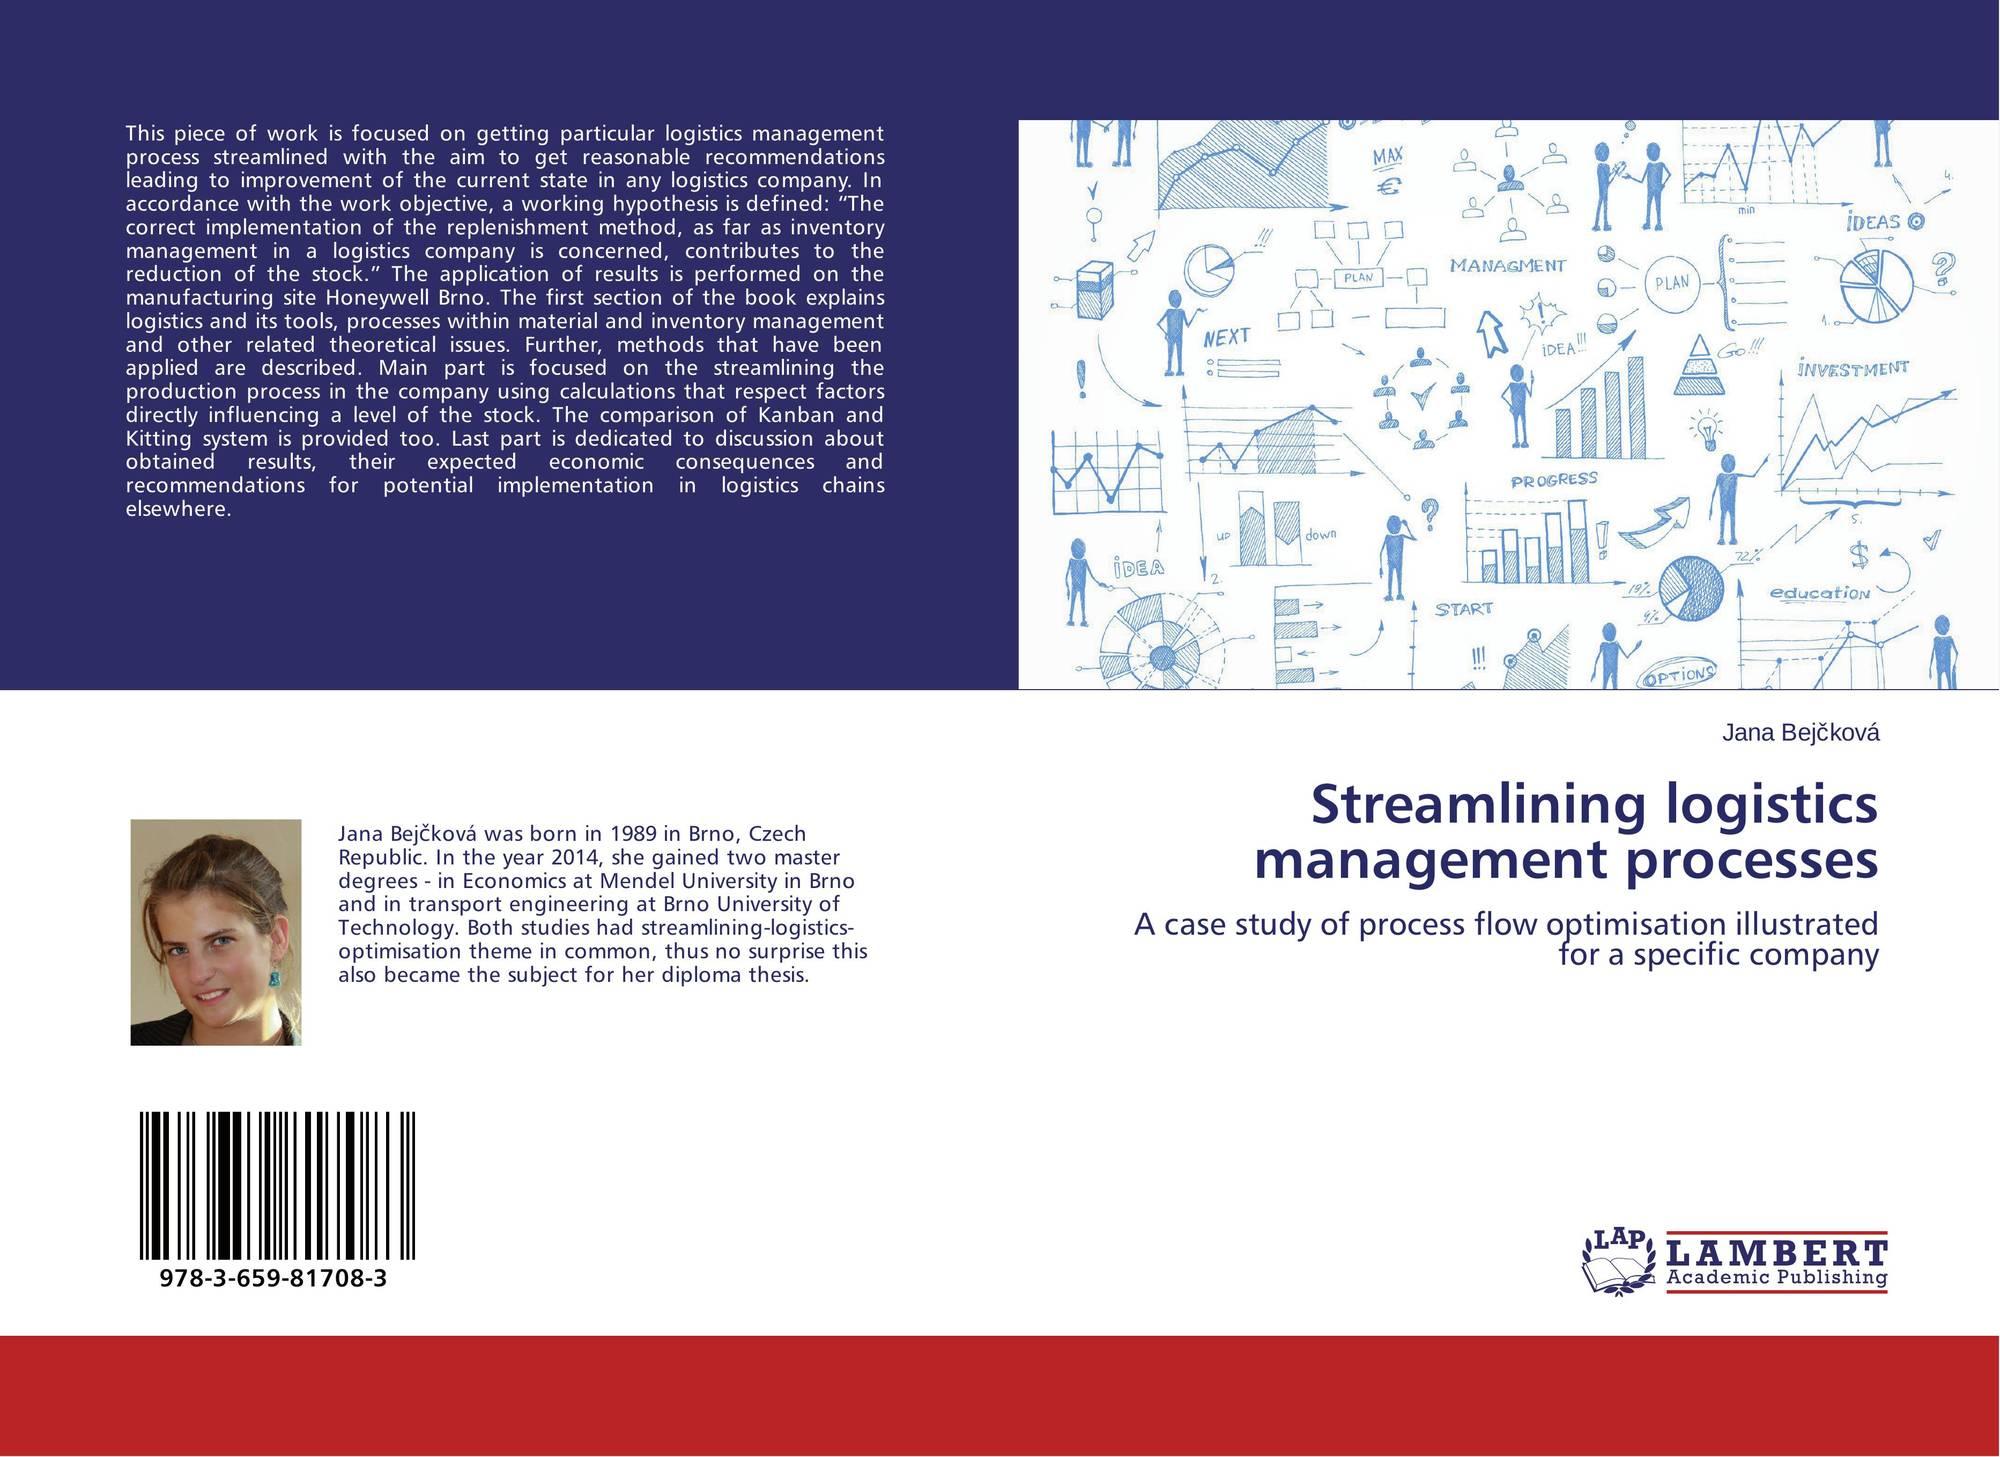 Streamlining logistics management processes, 978-3-659-81708-3 ...